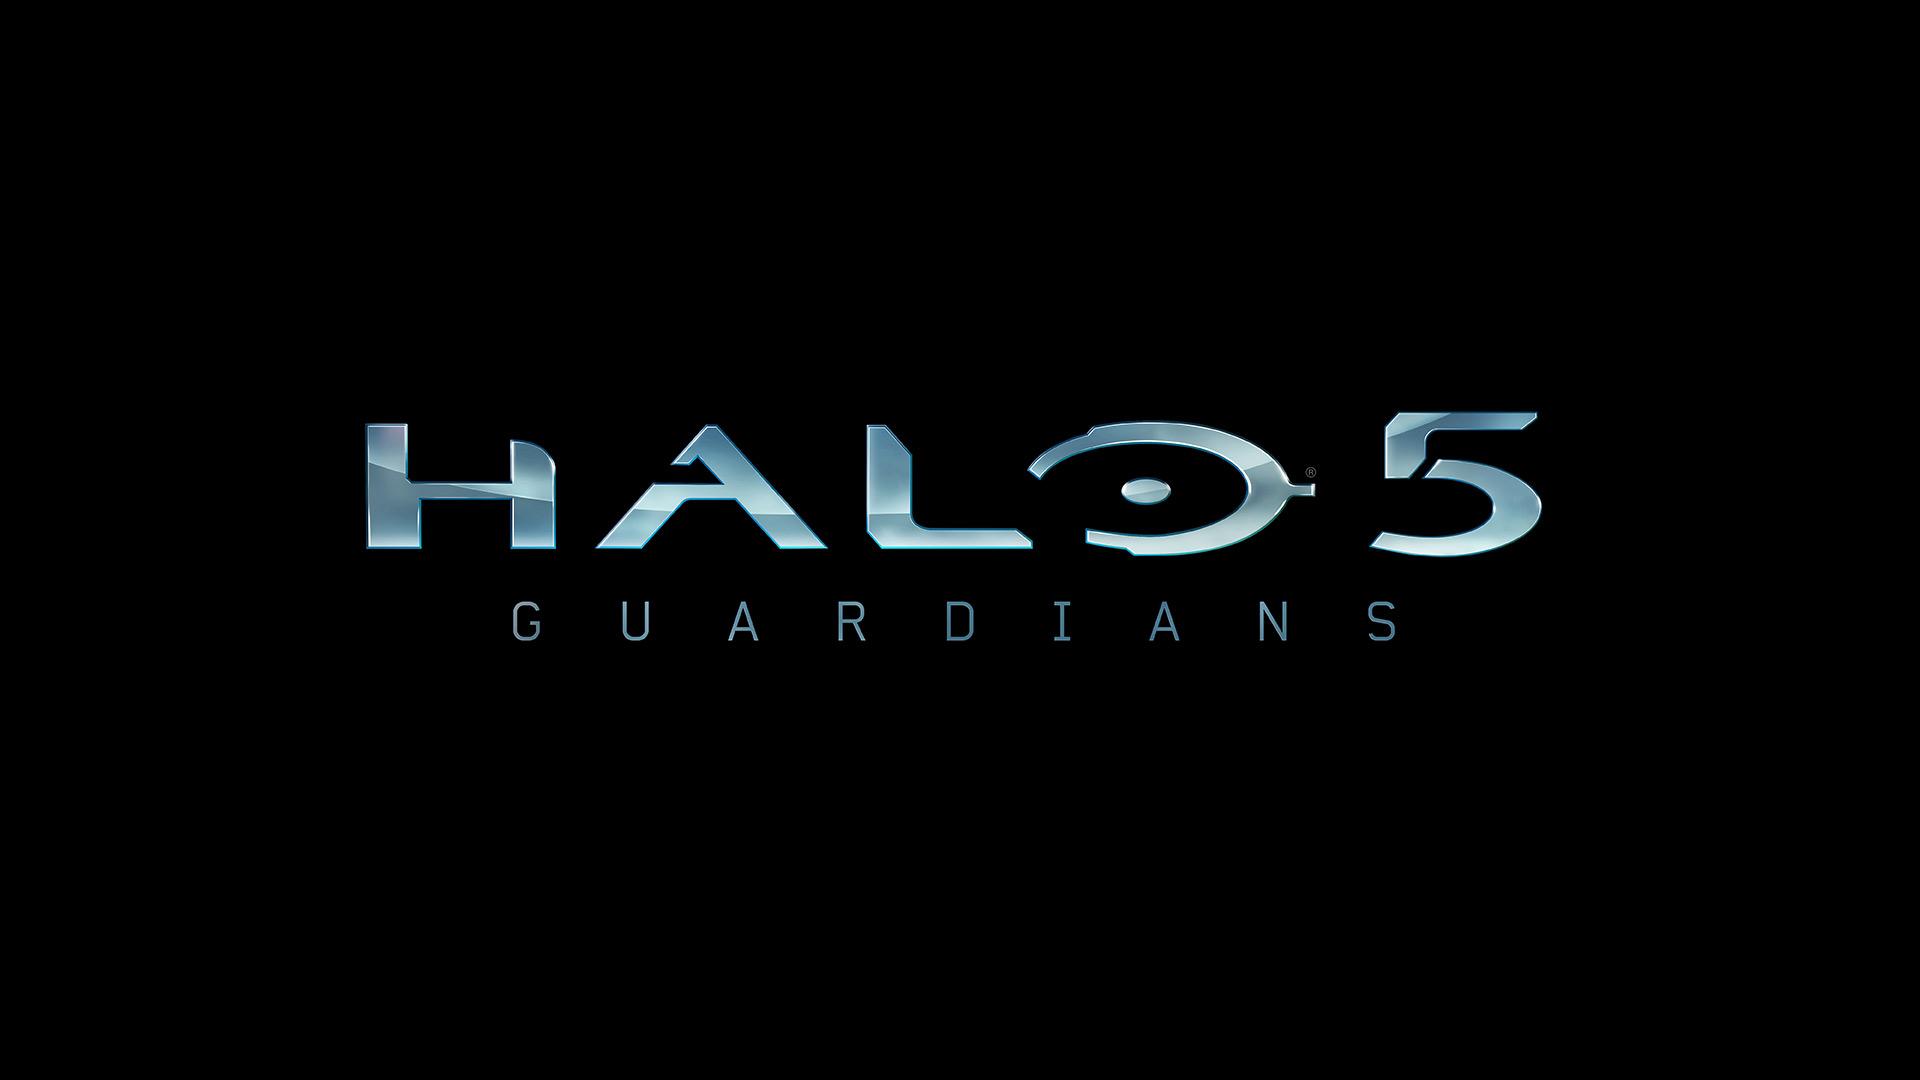 Halo-Guardians-wallpaper-wp3806208